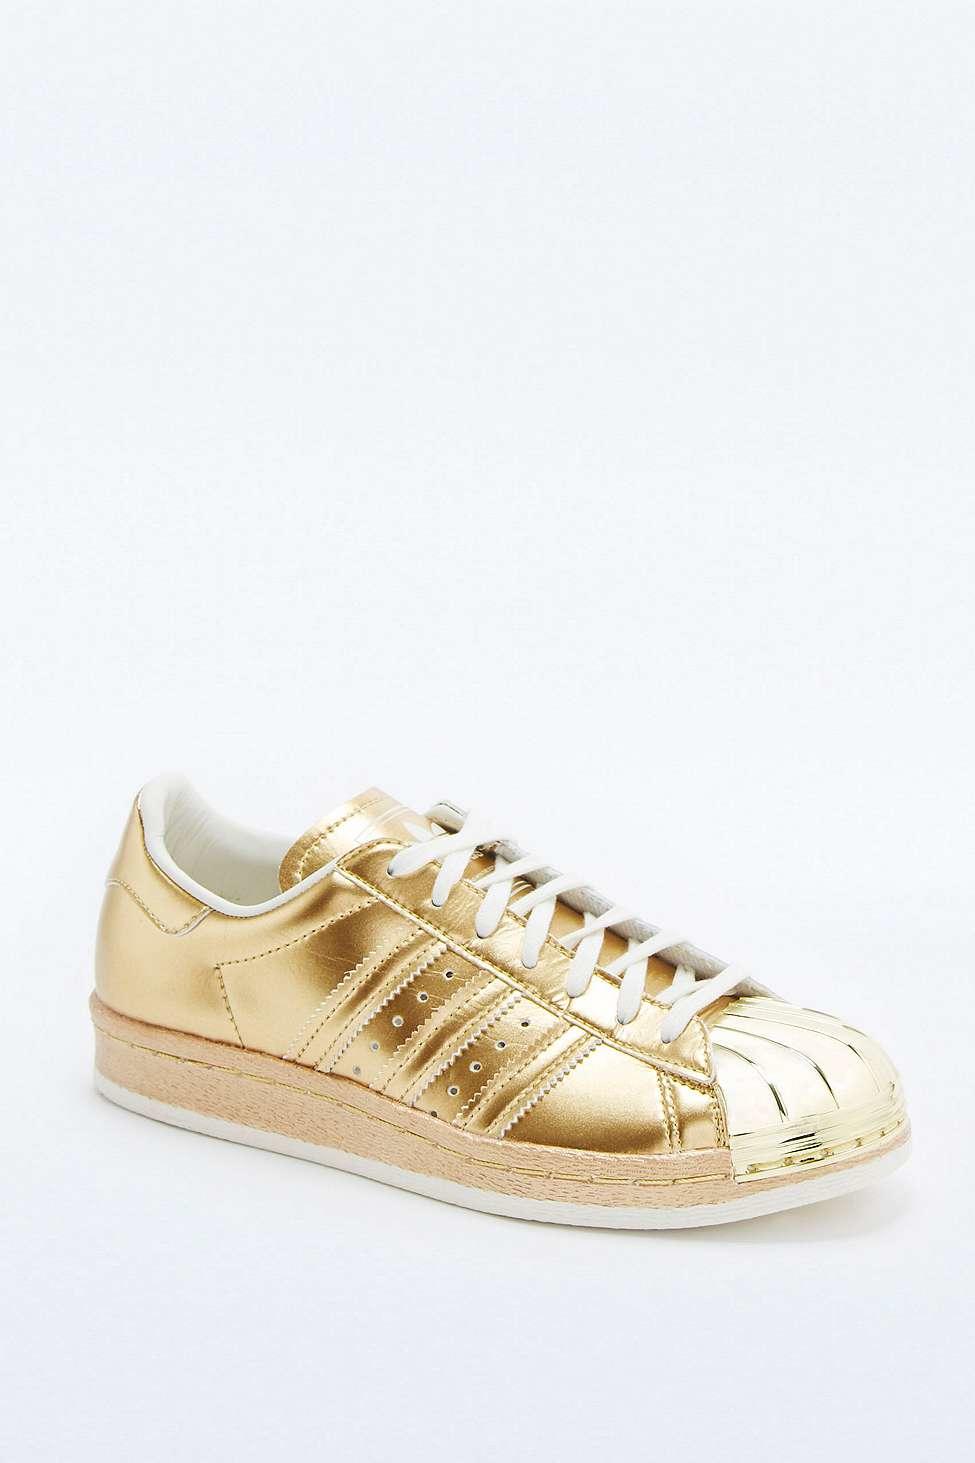 eb3ecef34ada adidas Originals Superstar 80s Metallic Gold Trainers in Metallic - Lyst